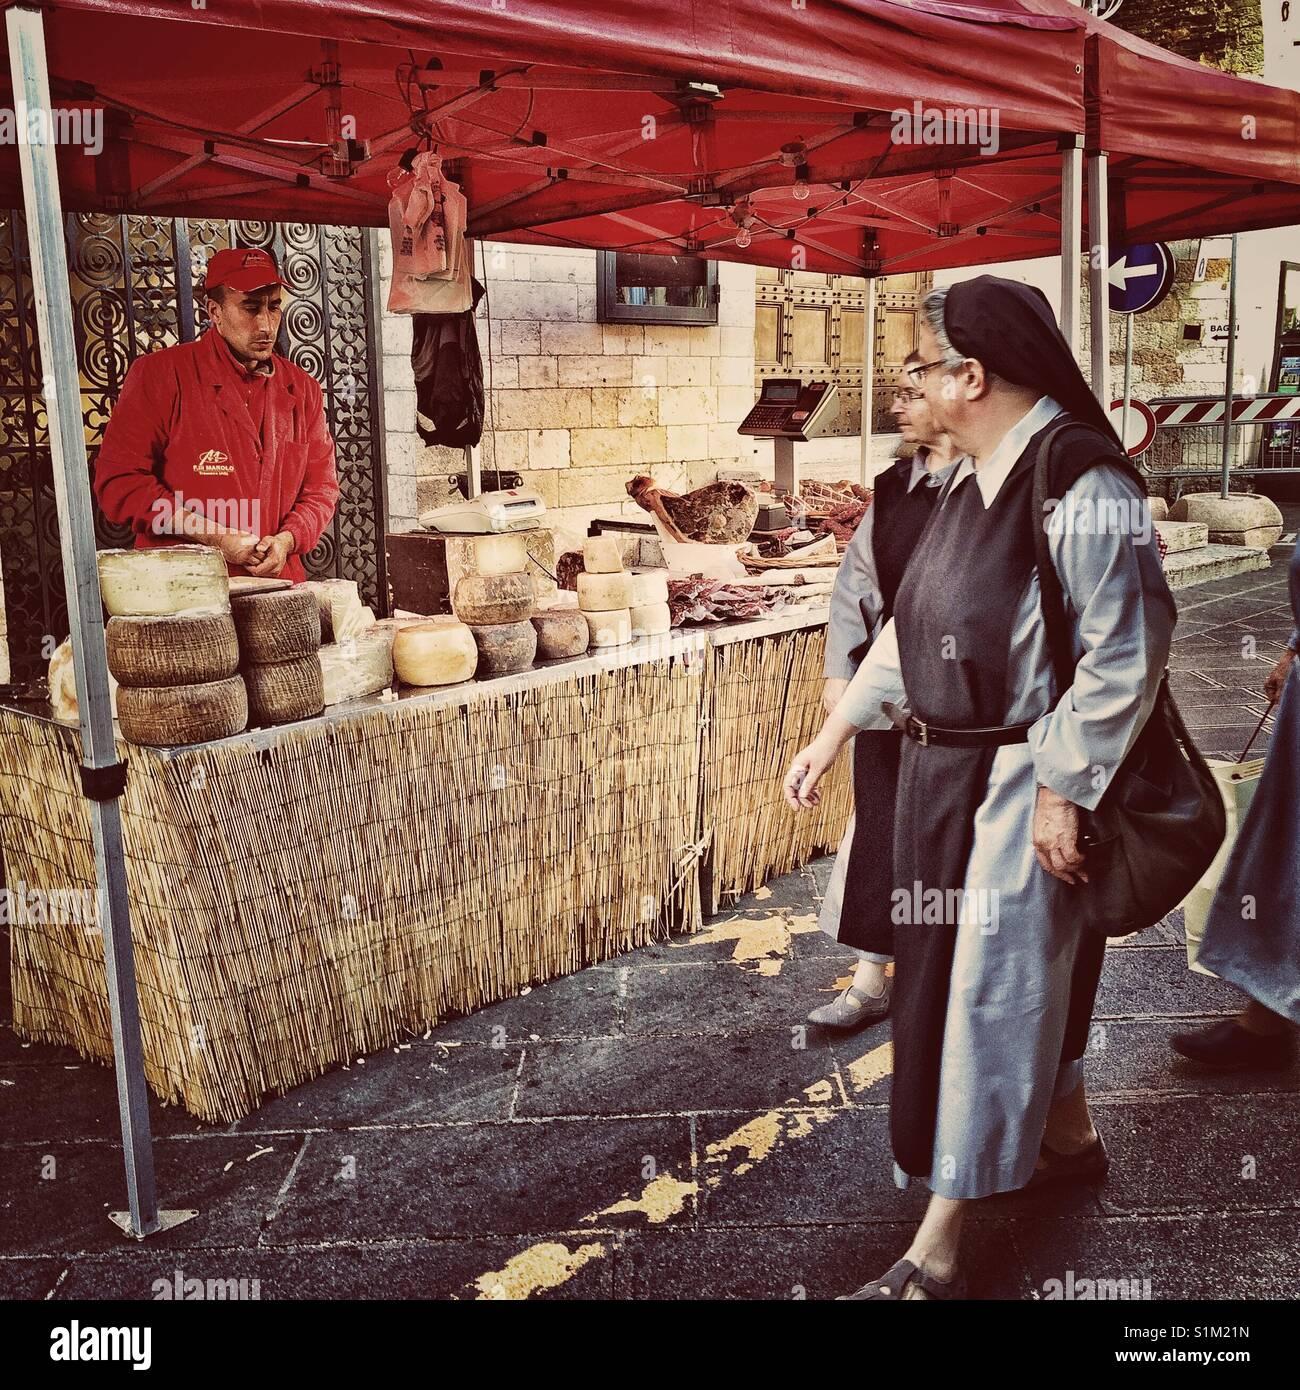 Franziskanerinnen eyeing der Käse auf dem Markt in Assisi, Italien. Stockbild